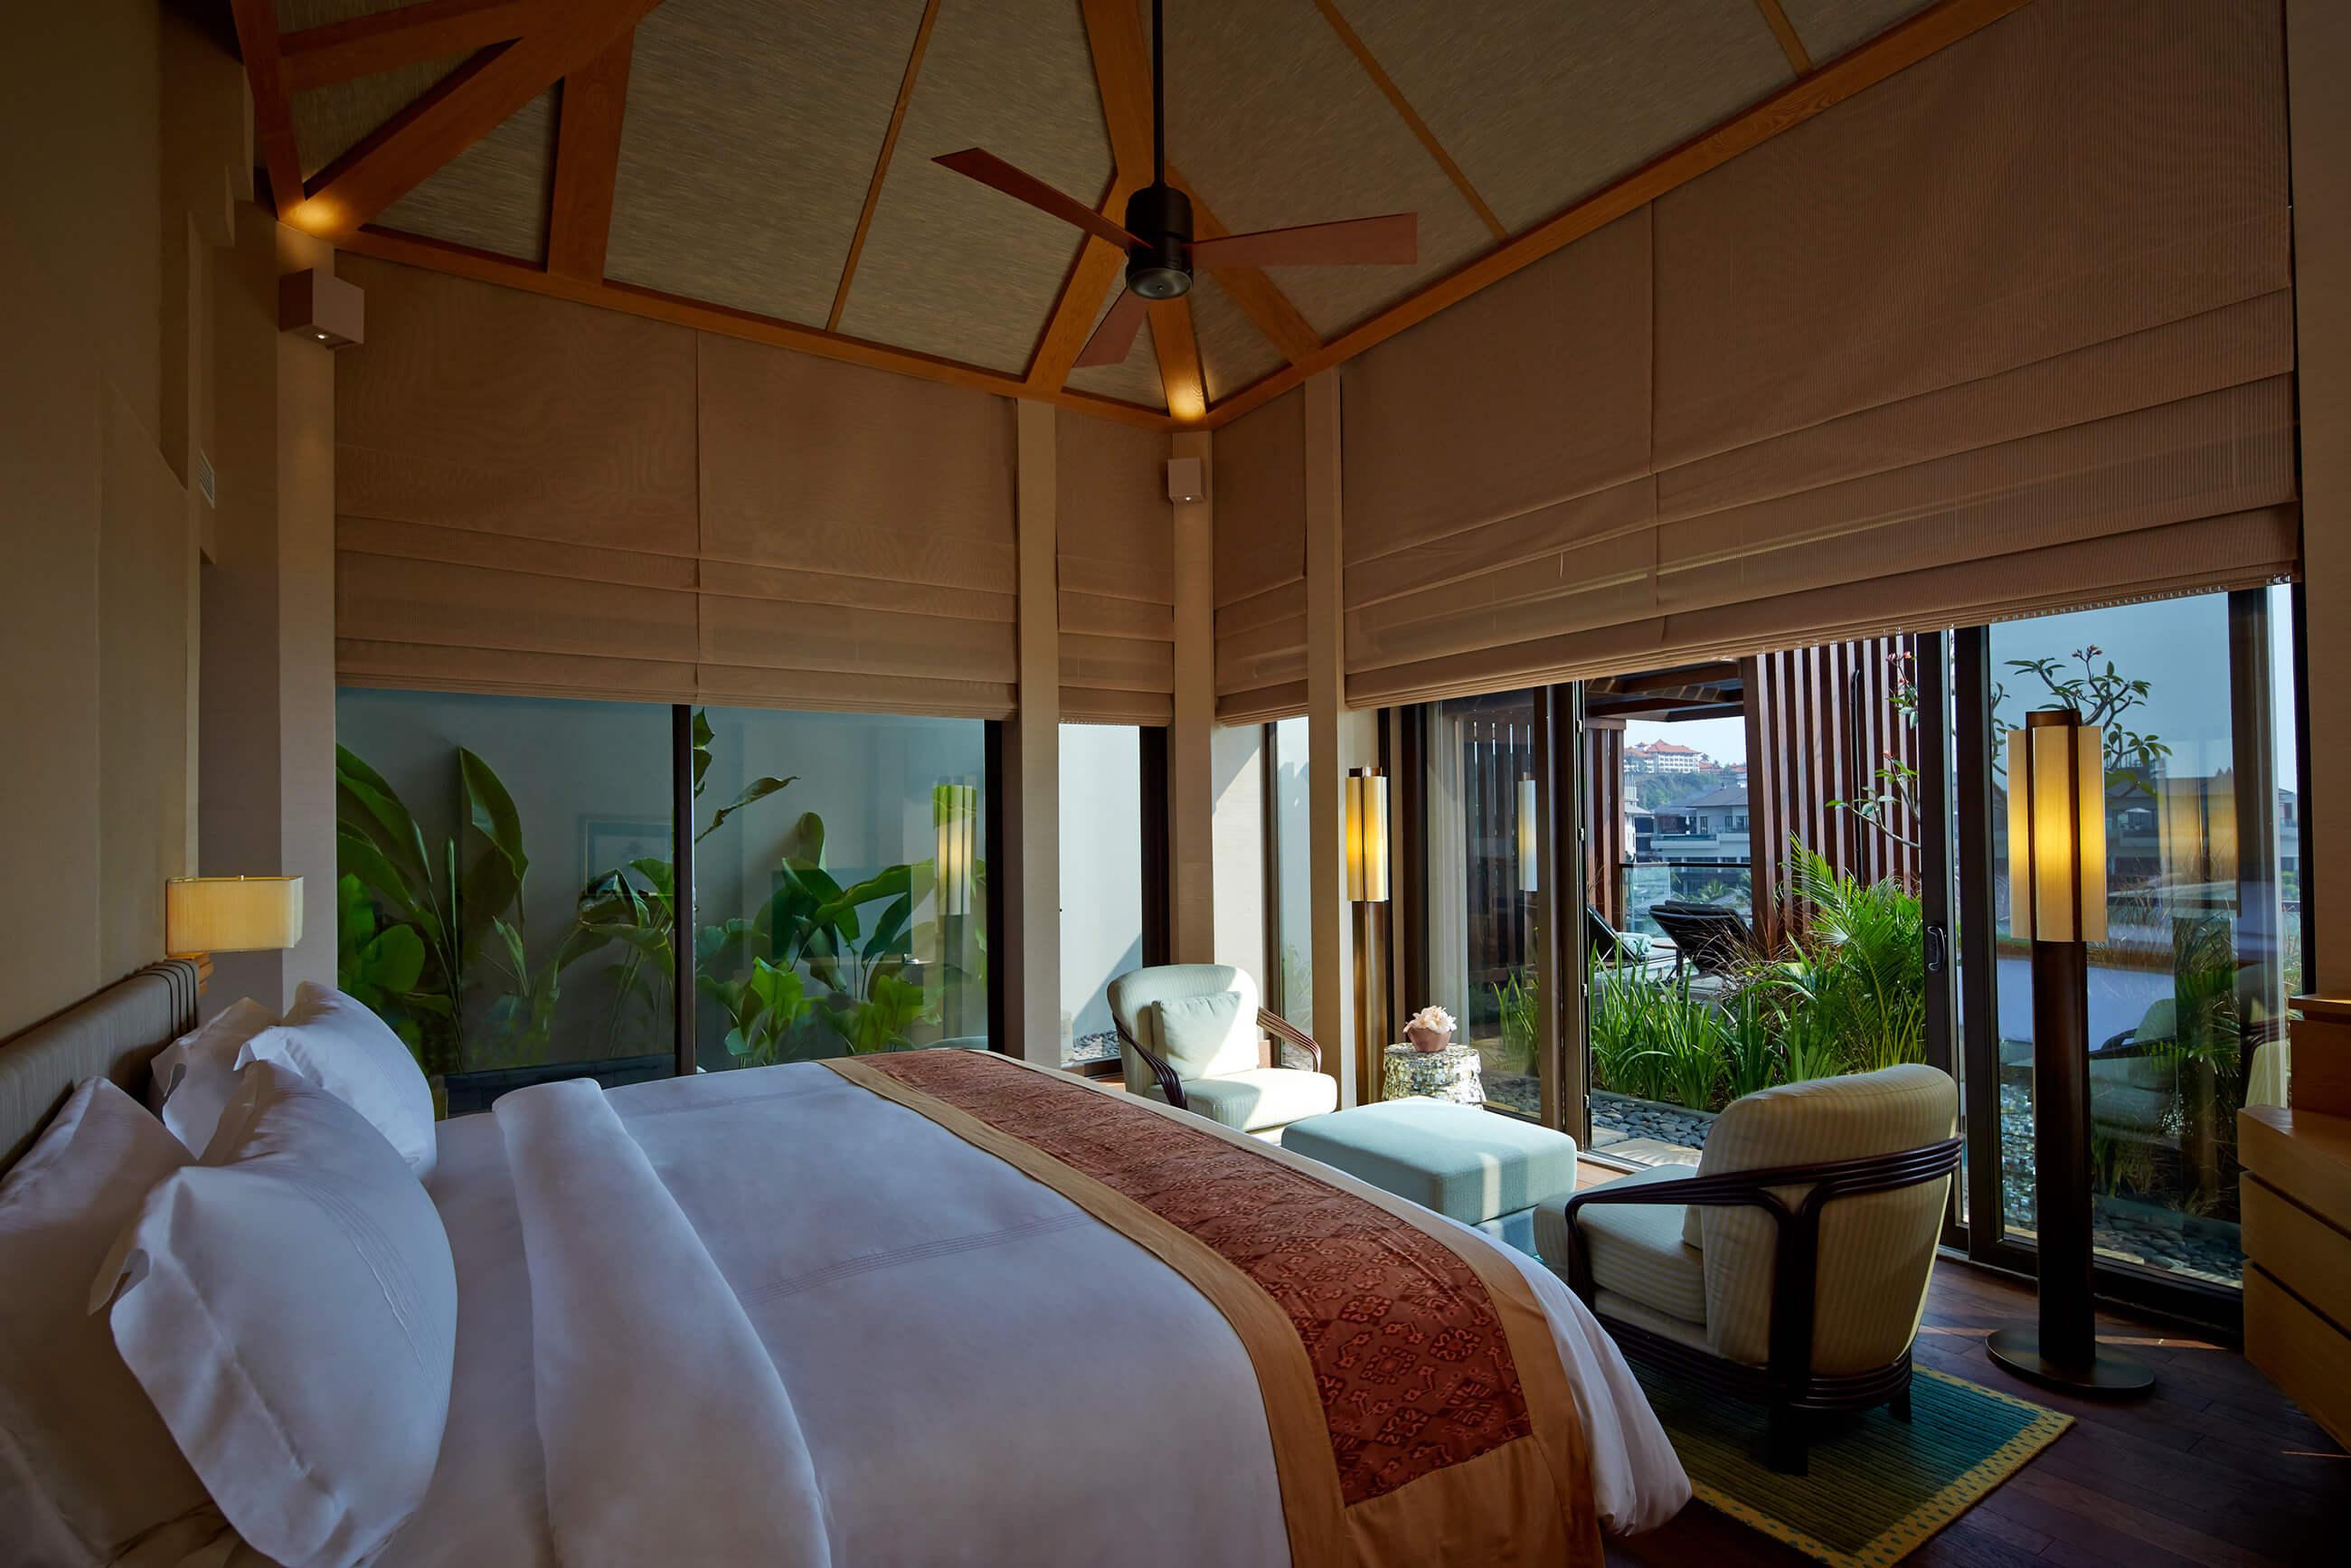 https://bubo.sk/uploads/galleries/4921/ritzcarlton_bali__the-sky-villa-bedroom.jpg